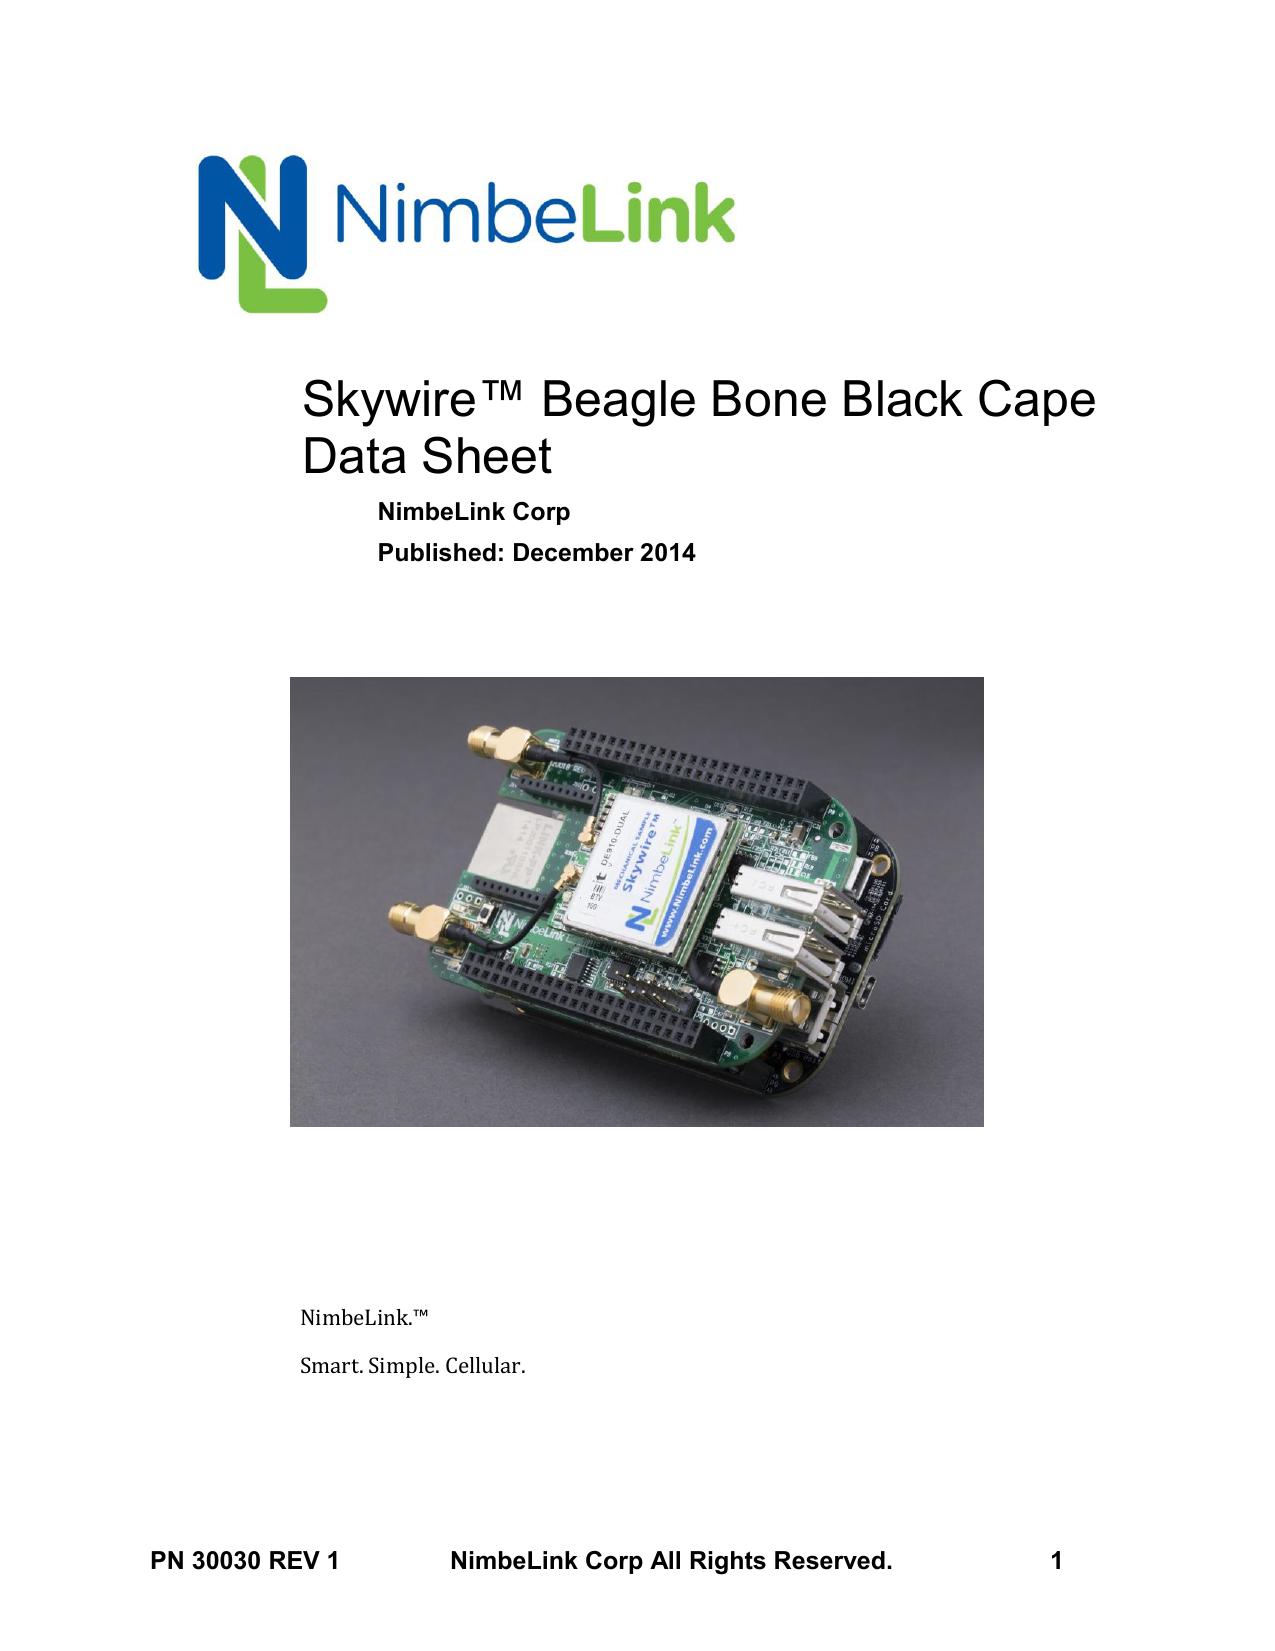 Skywire™ Beagle Bone Black Cape Data Sheet | manualzz com